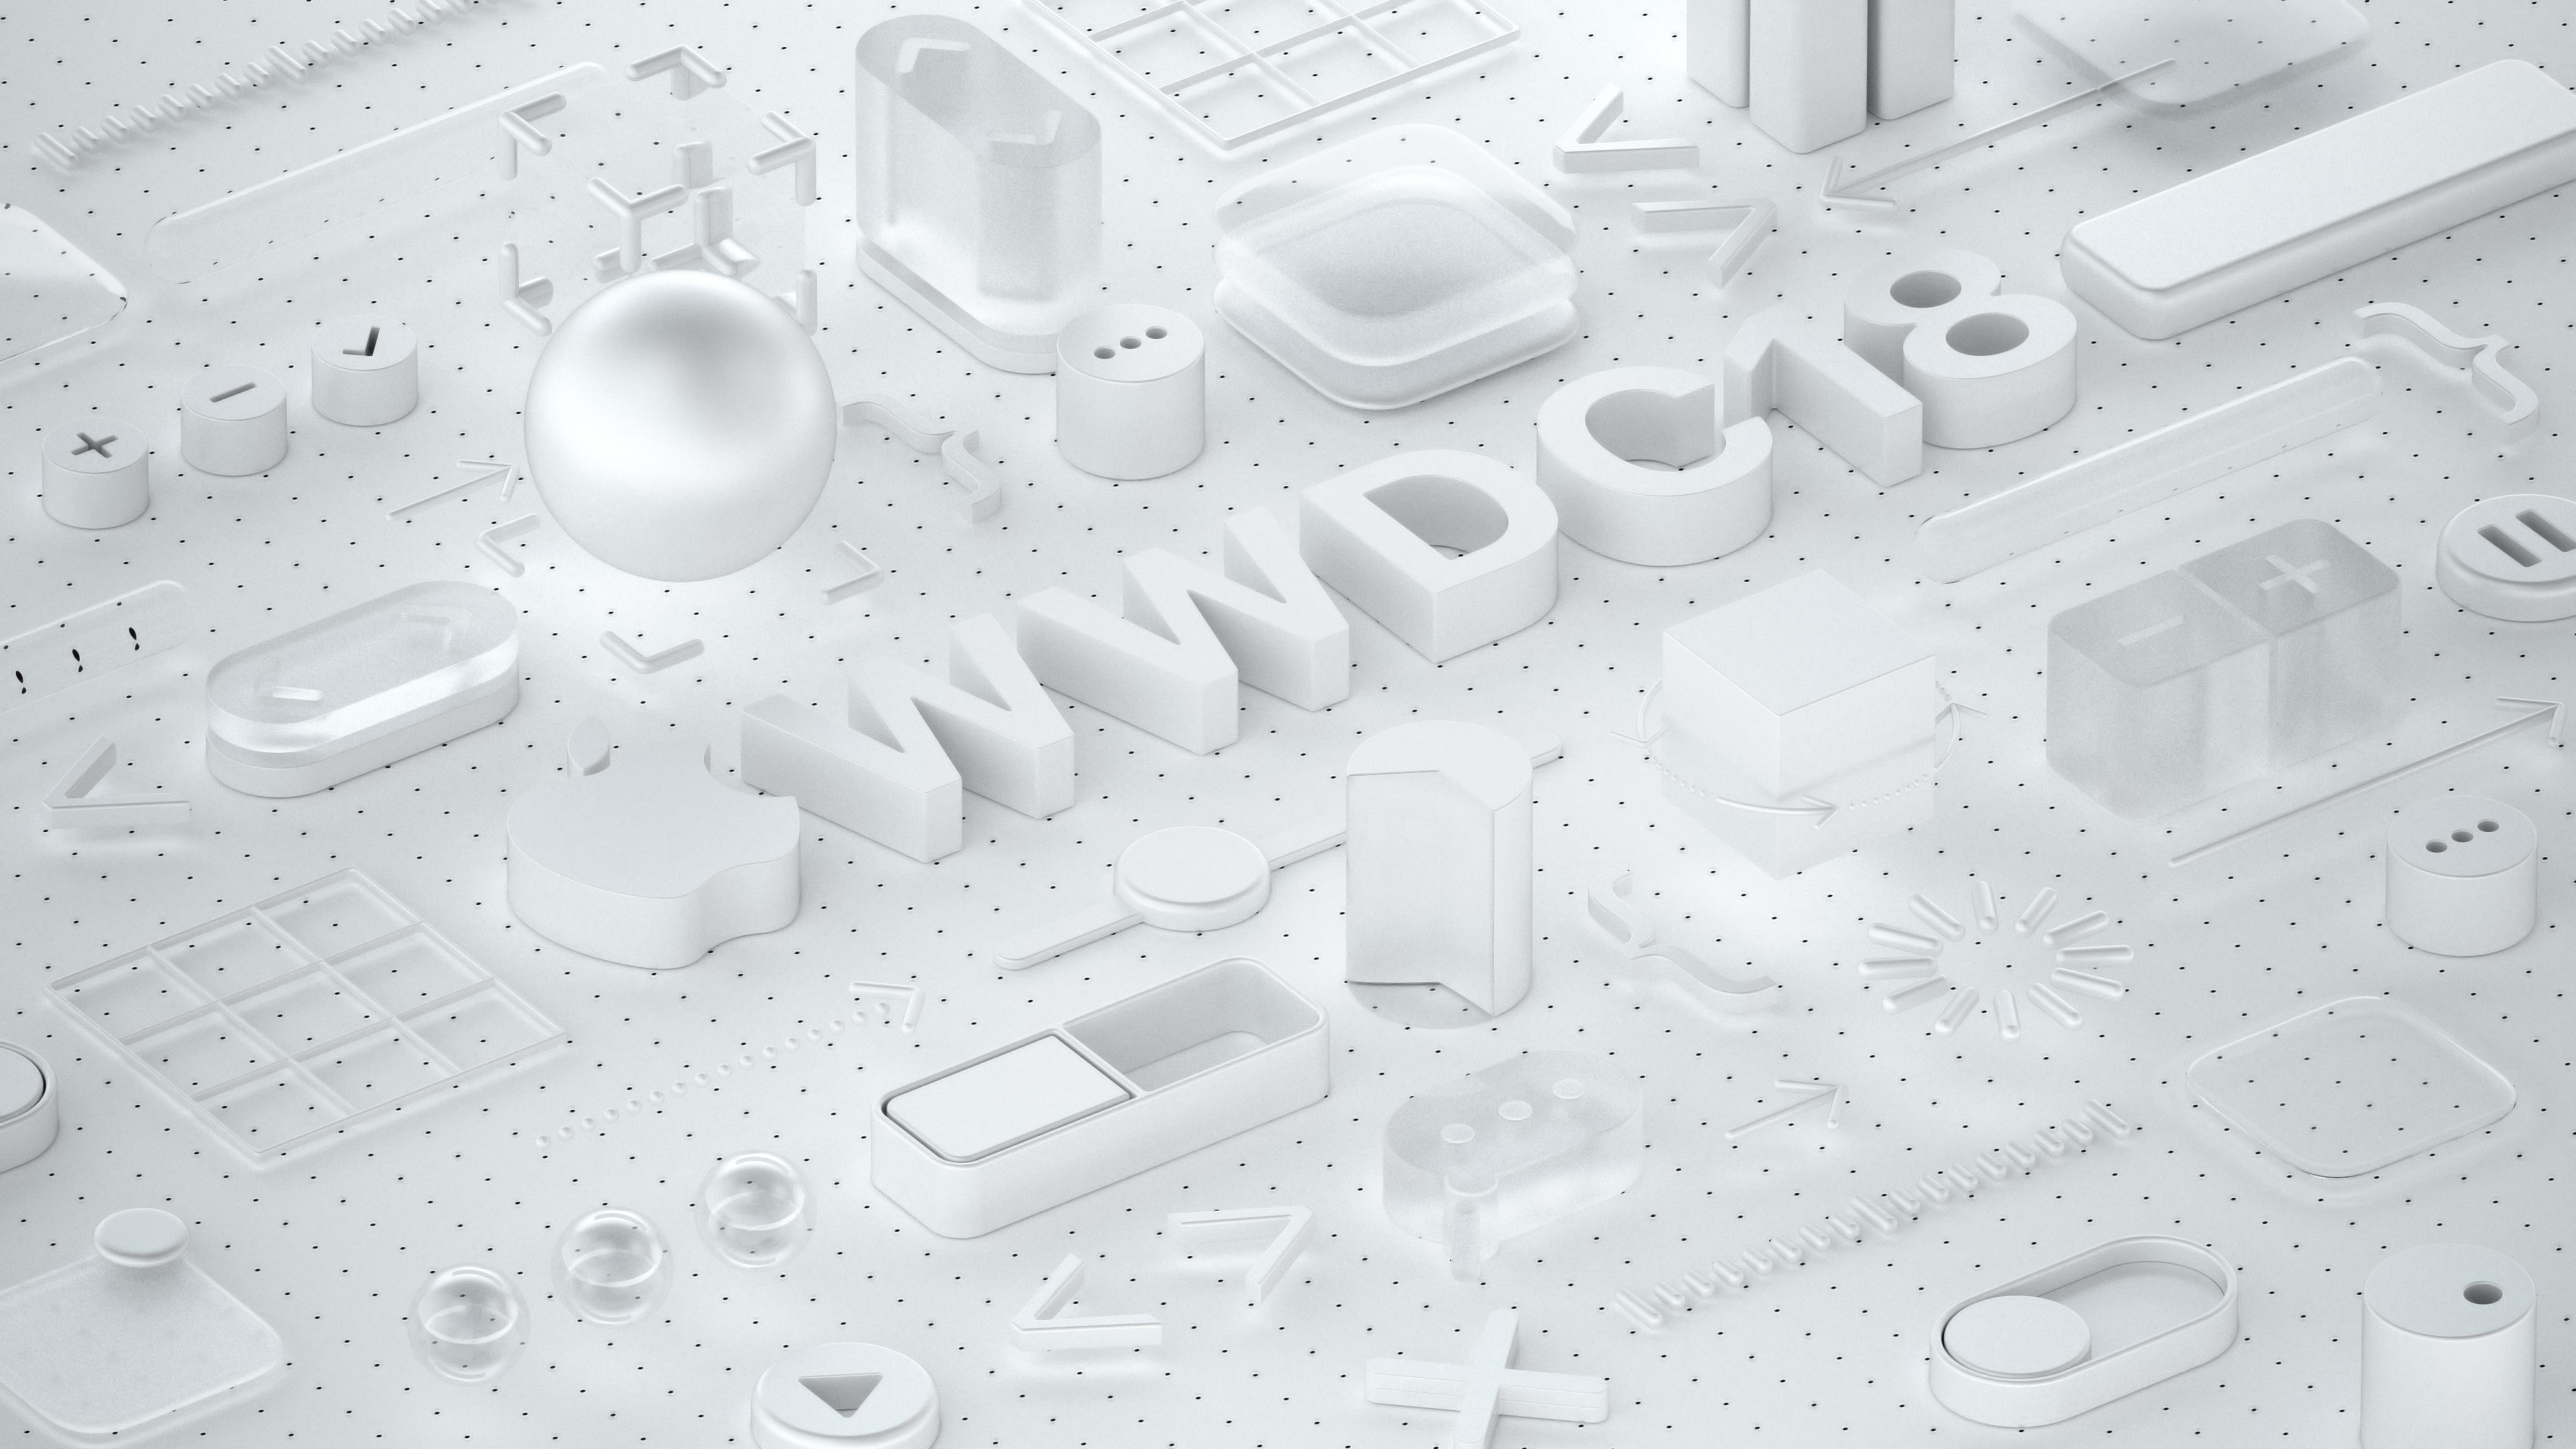 Wwdc2018 Mac用壁紙が公開 公式デザインを使用 私設apple委員会